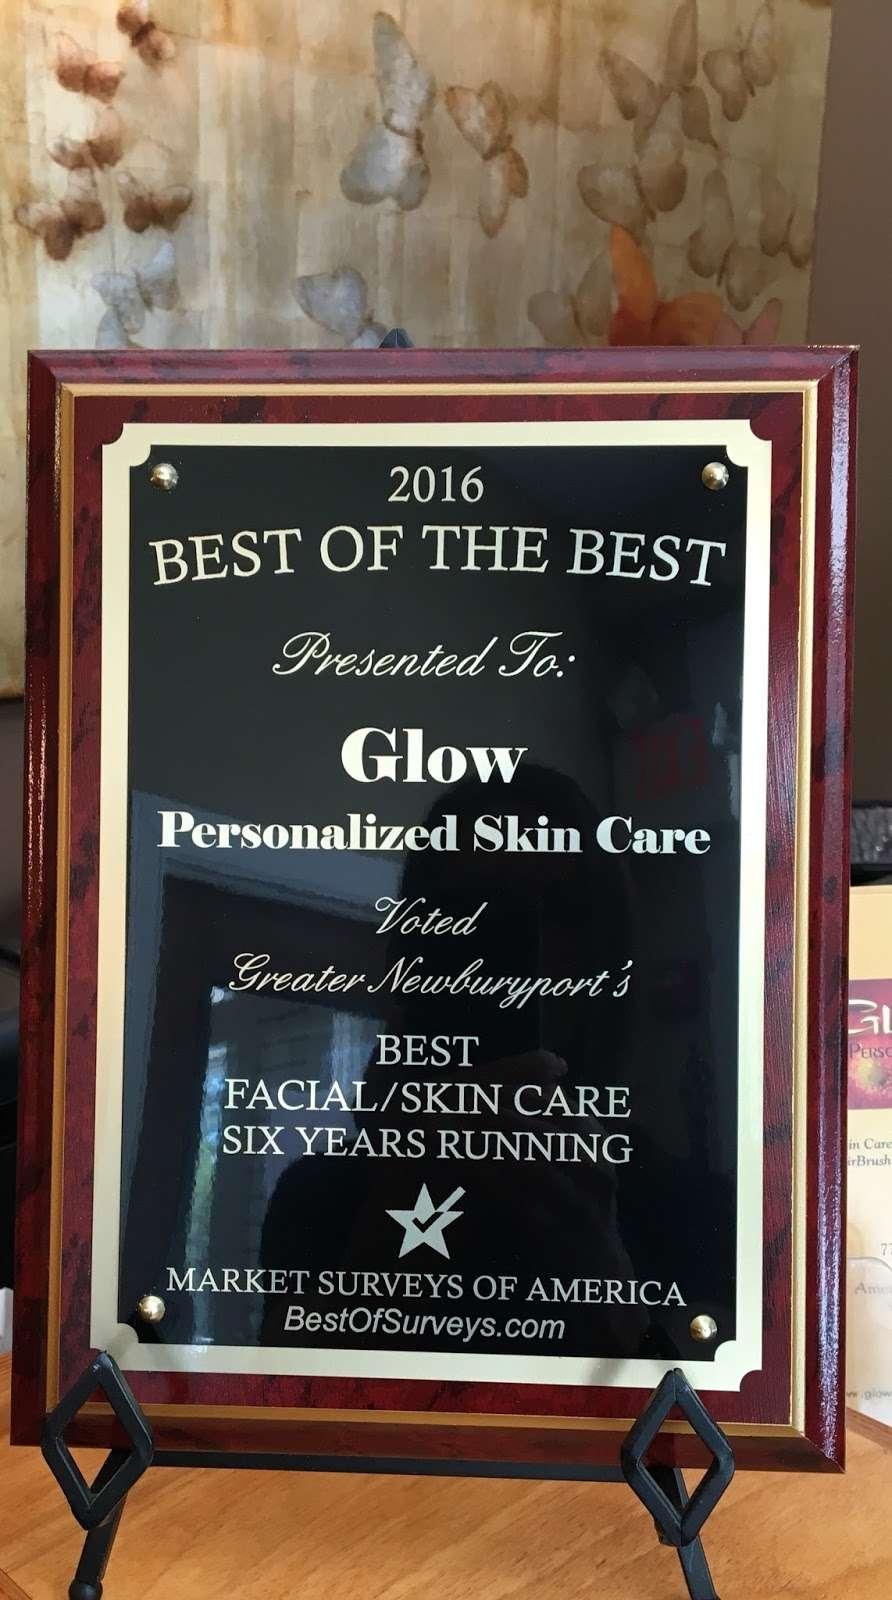 Glow Personalized Skin Care - hair care  | Photo 6 of 6 | Address: 77 Macy St, Amesbury, MA 01913, USA | Phone: (978) 388-4224